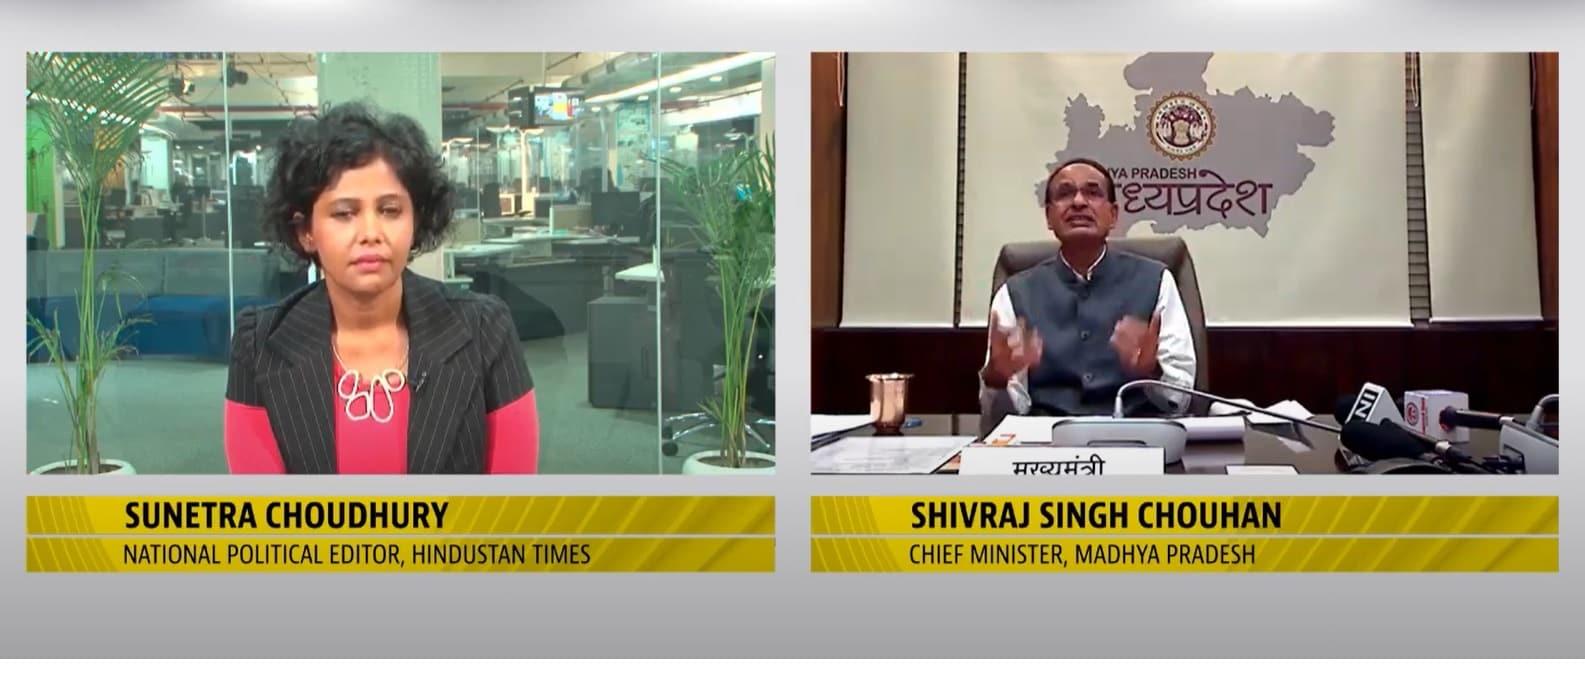 <p>Built Covid infrastructure single-handedly: Shivraj Chouhan</p>